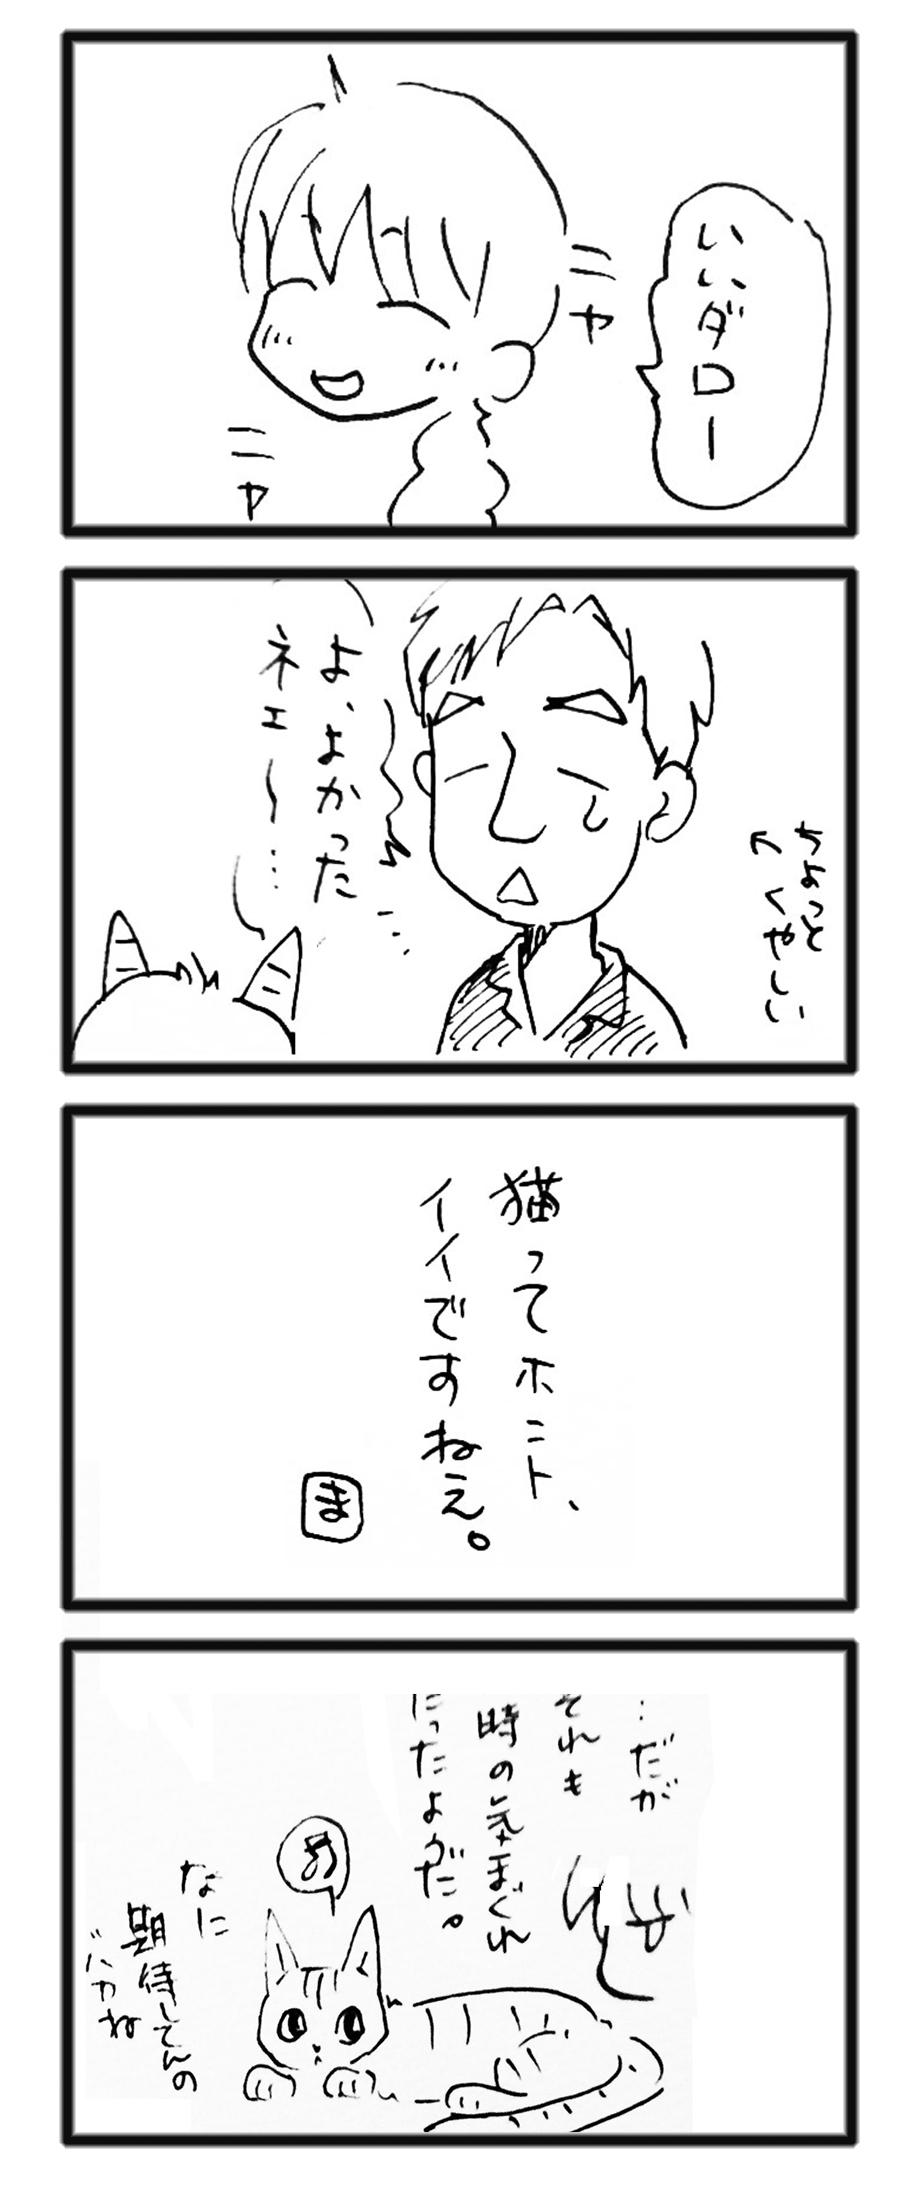 20130506_05